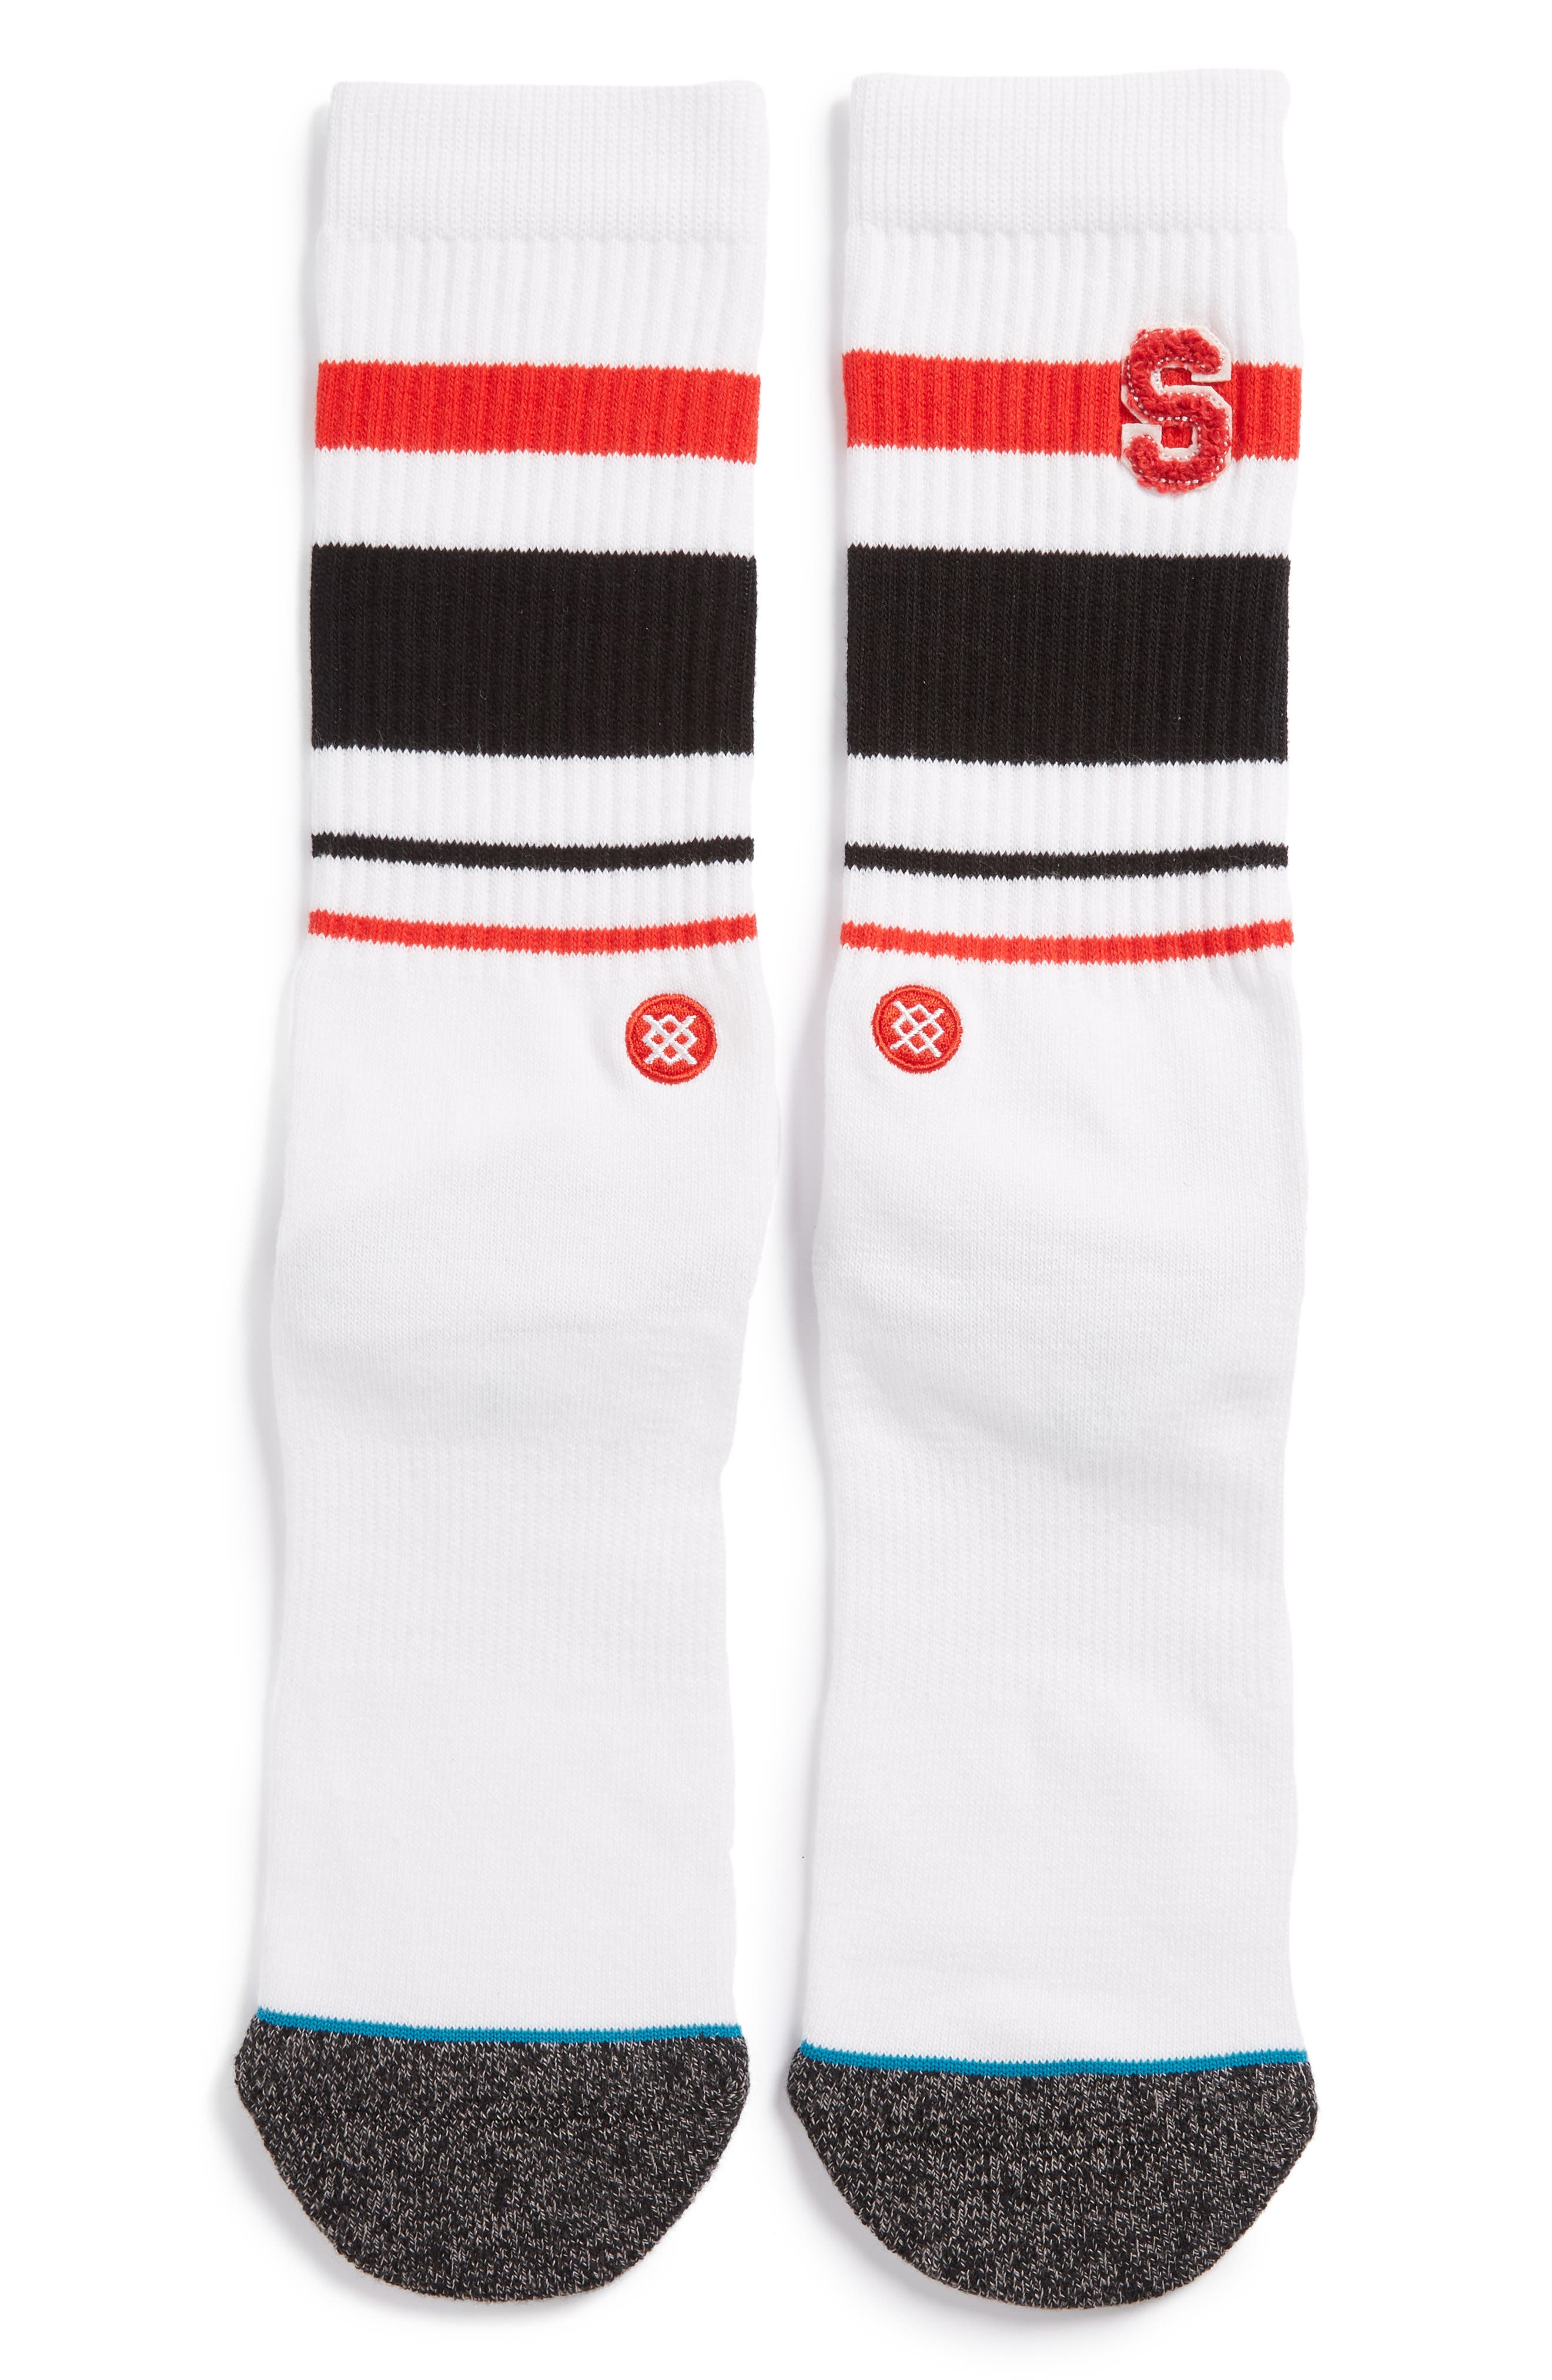 JV Crew Socks,                             Main thumbnail 1, color,                             White